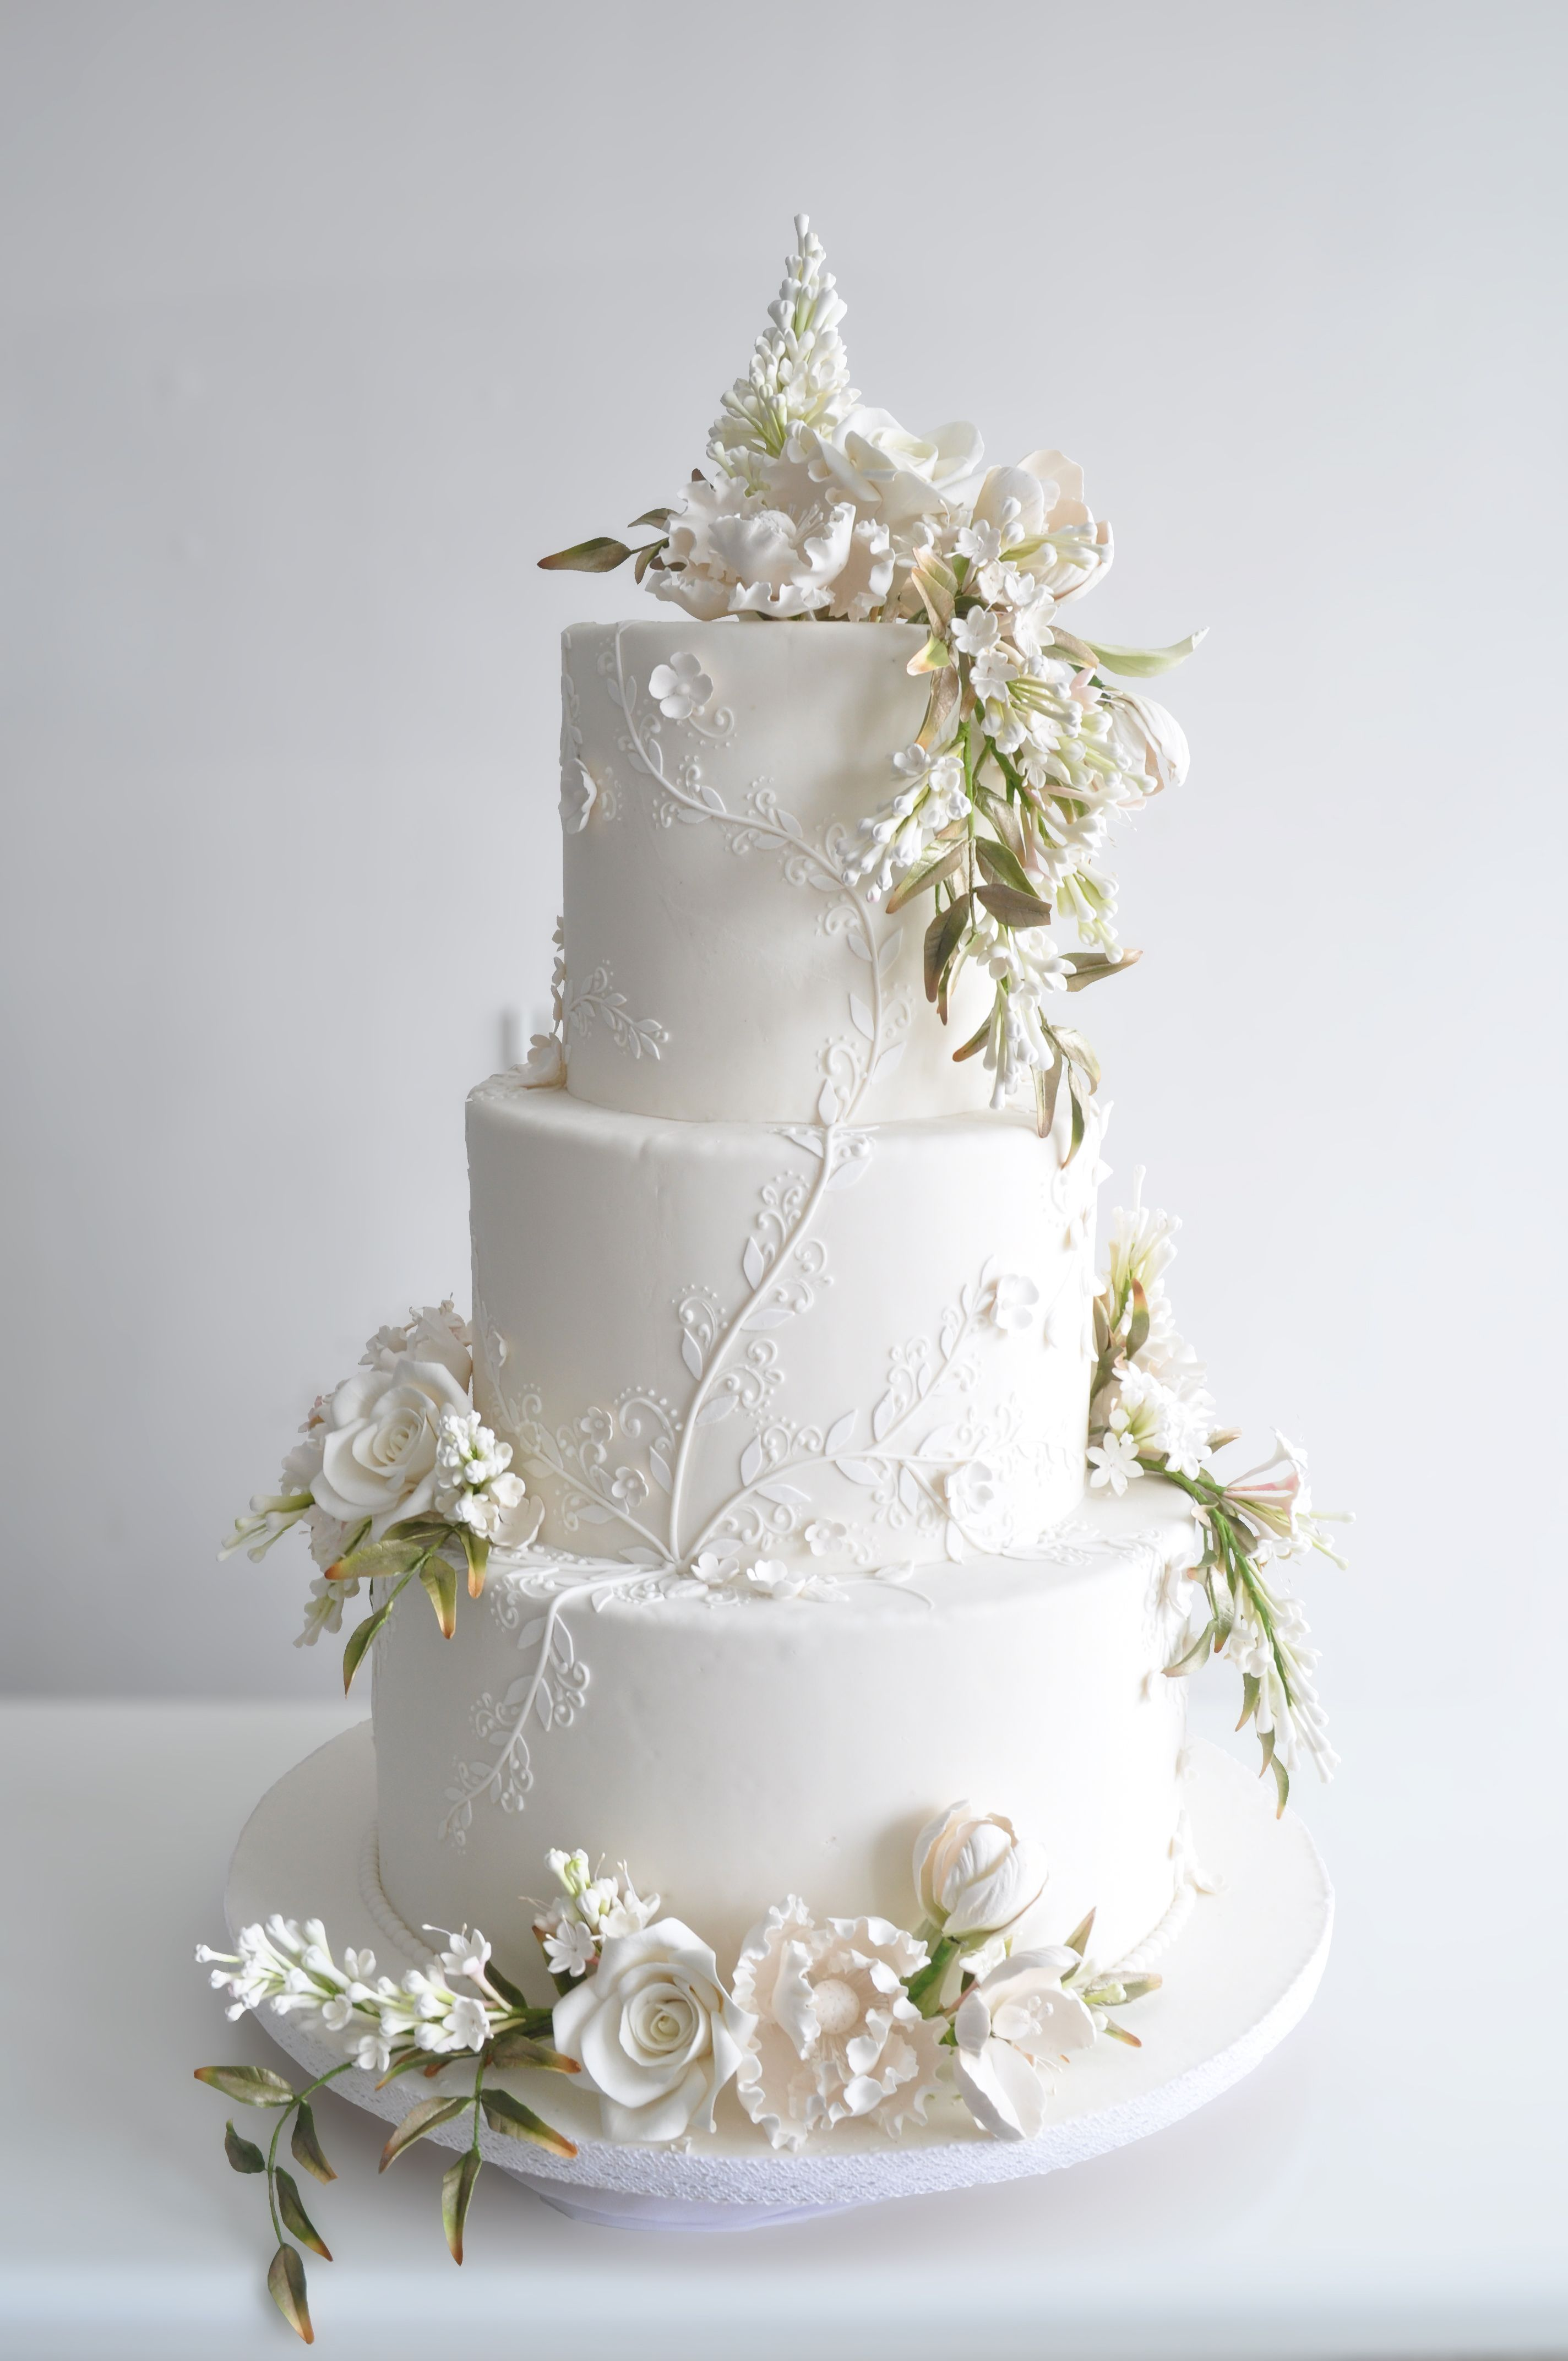 3 Tiers - Le Novelle Cake | Jakarta & Bali Wedding Cake ...